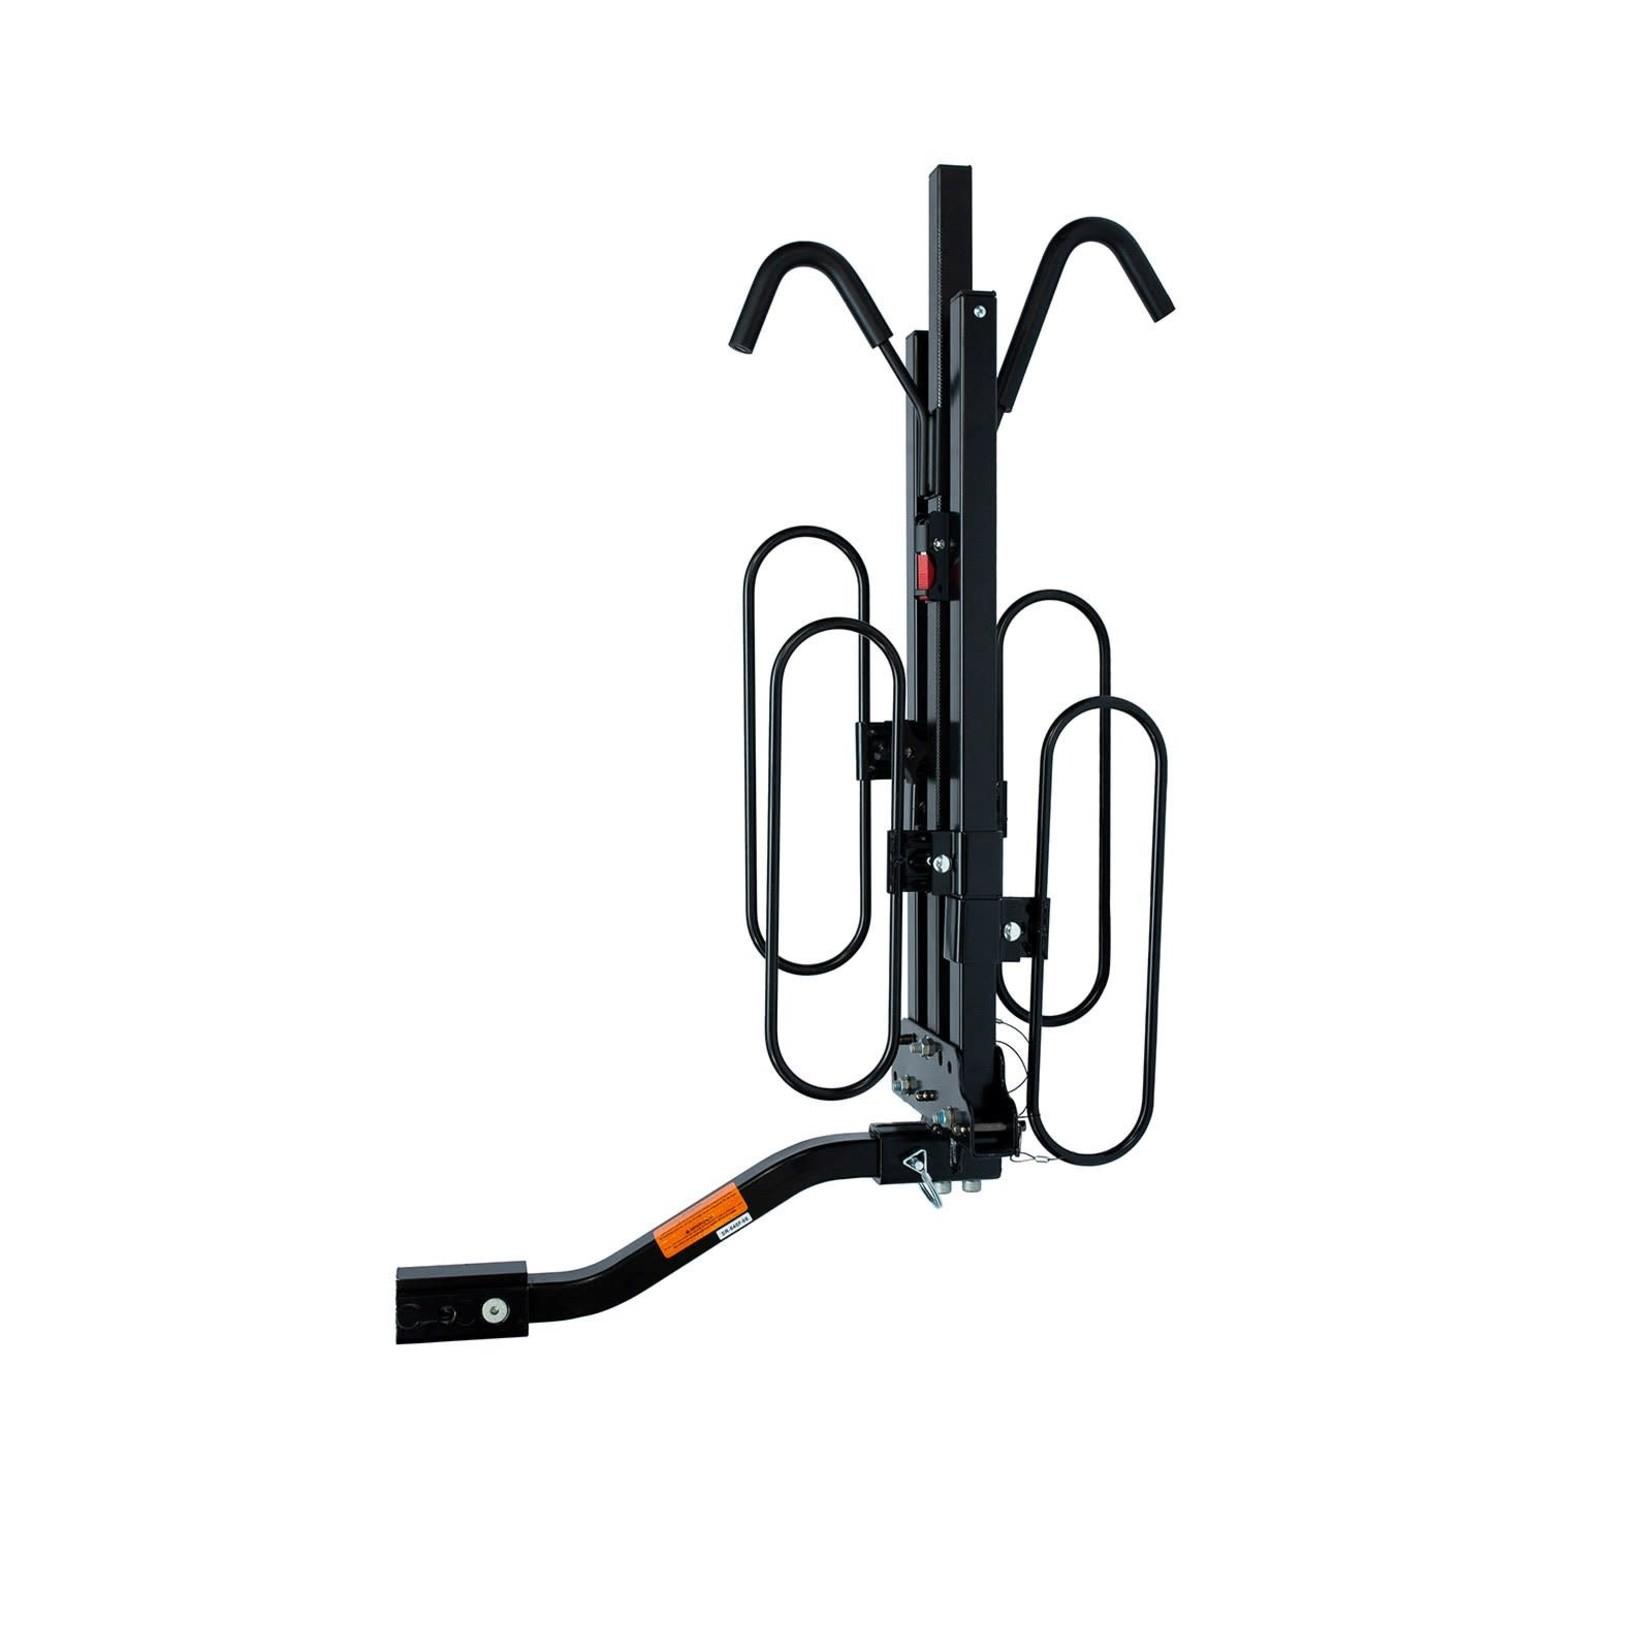 "Swagman Swagman Bike Rack, XC-2 Cross Country, 2"" & 1 1/4"" Receiver"